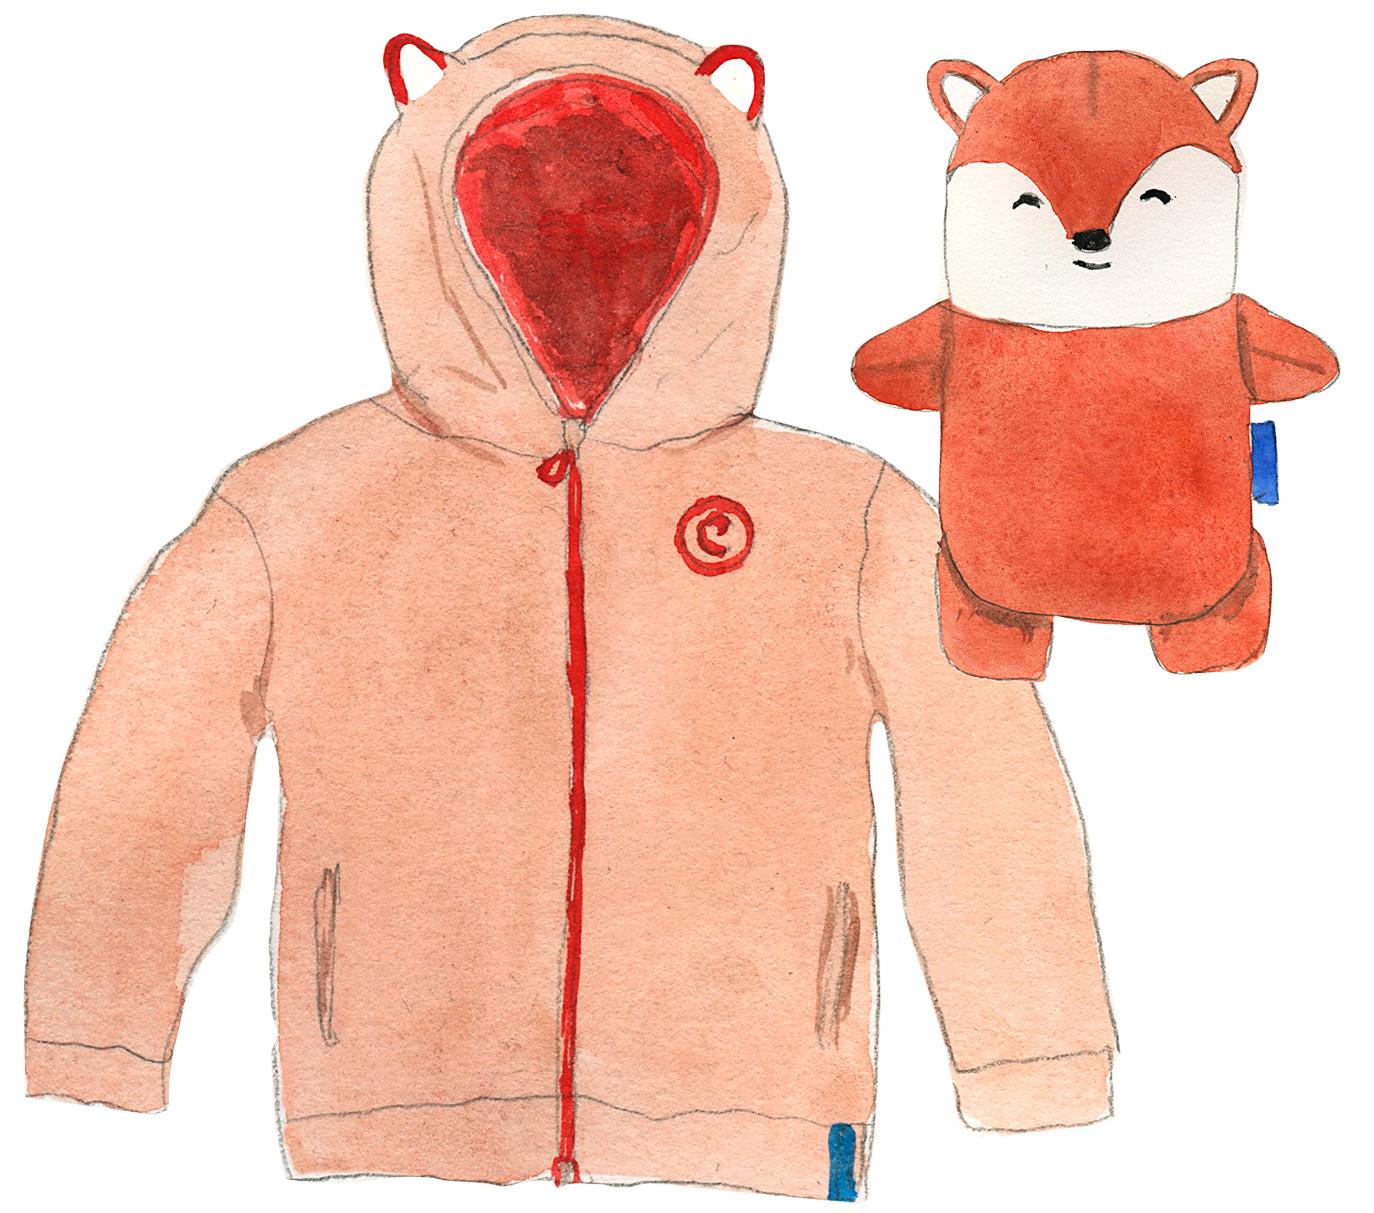 plush fox toy and Cubcoat illustration